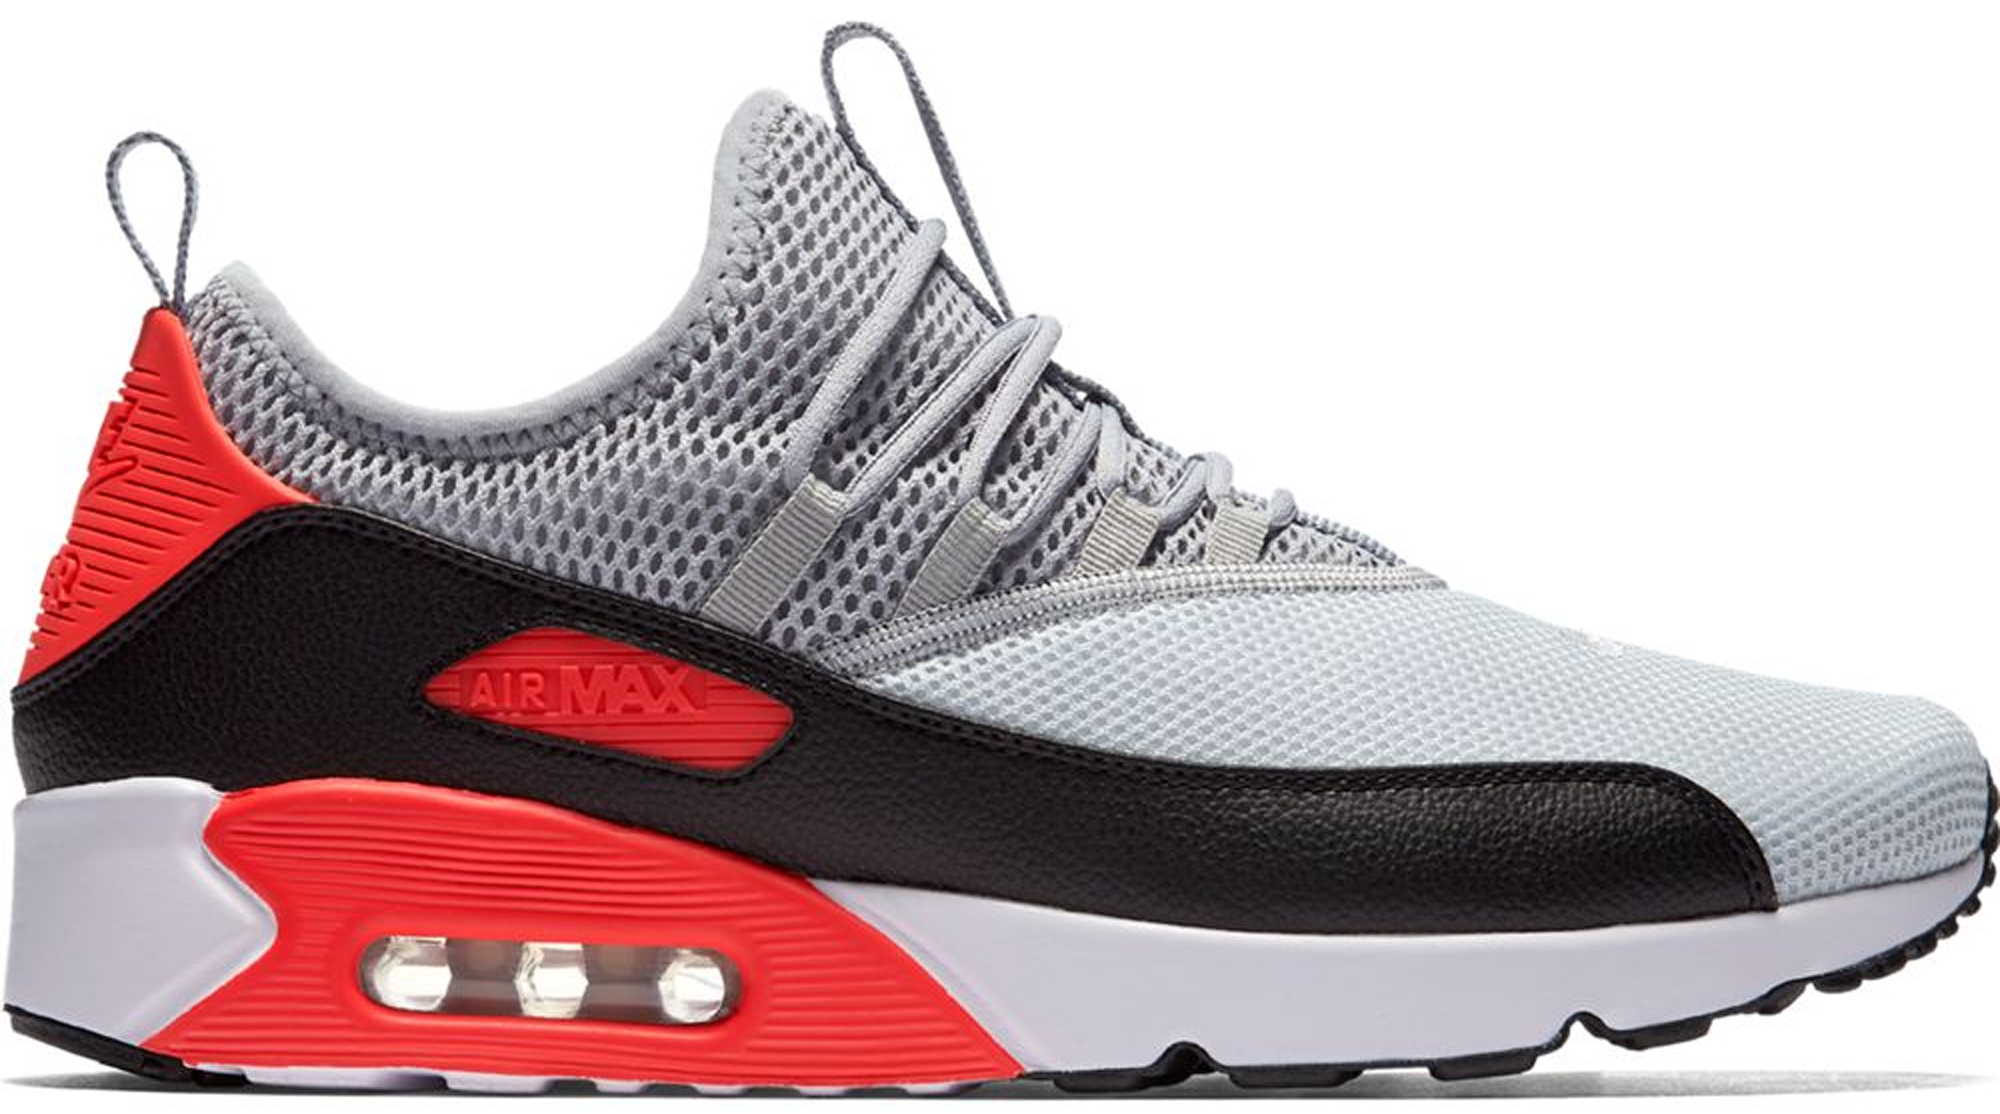 Nike Air Max 90 EZ Wolf Grey Bright